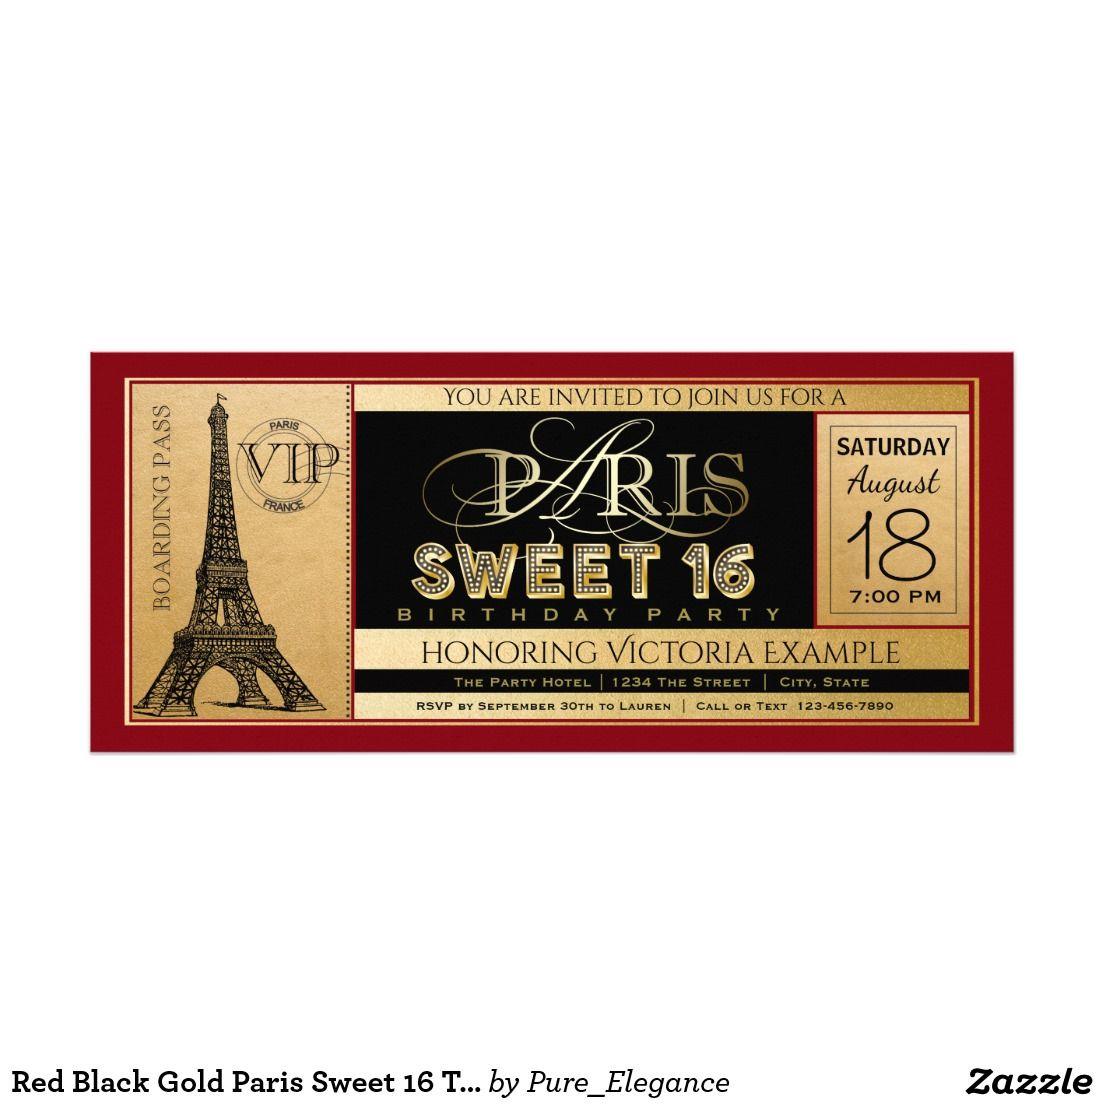 Red Black Gold Paris Sweet 16 Ticket Invitation   Paris sweet 16 ...